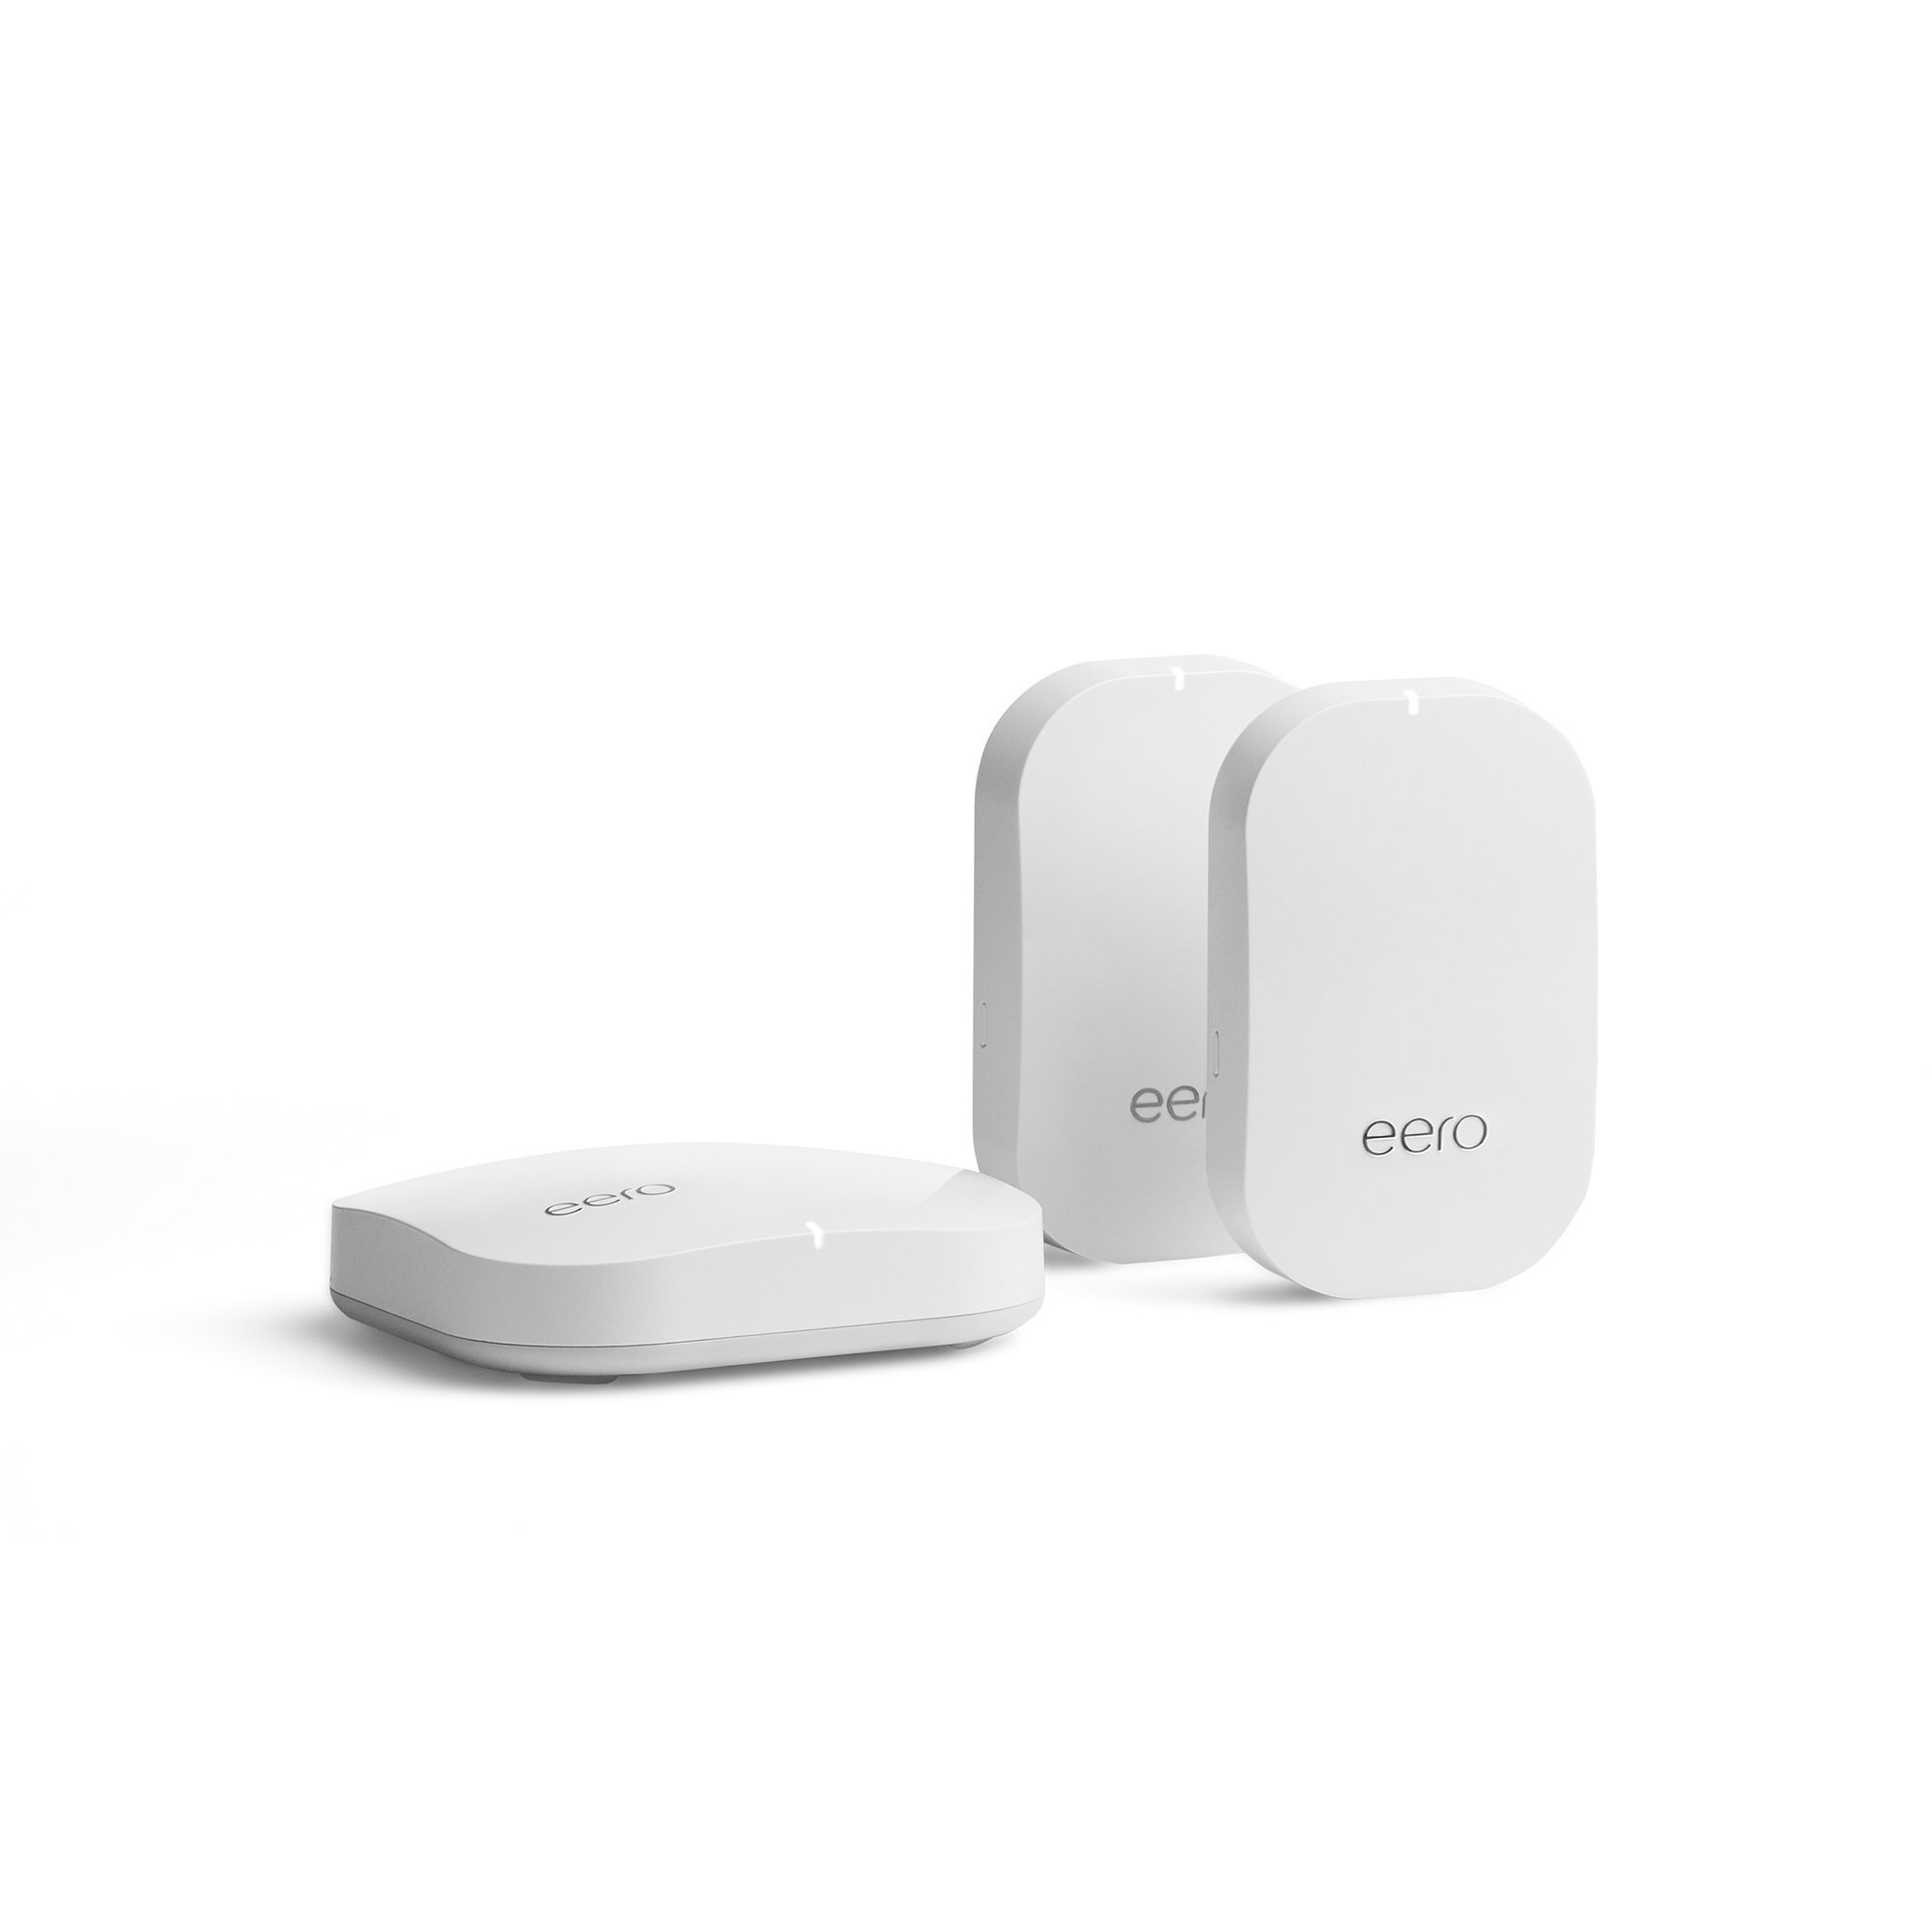 eero Home WiFi System Beacon